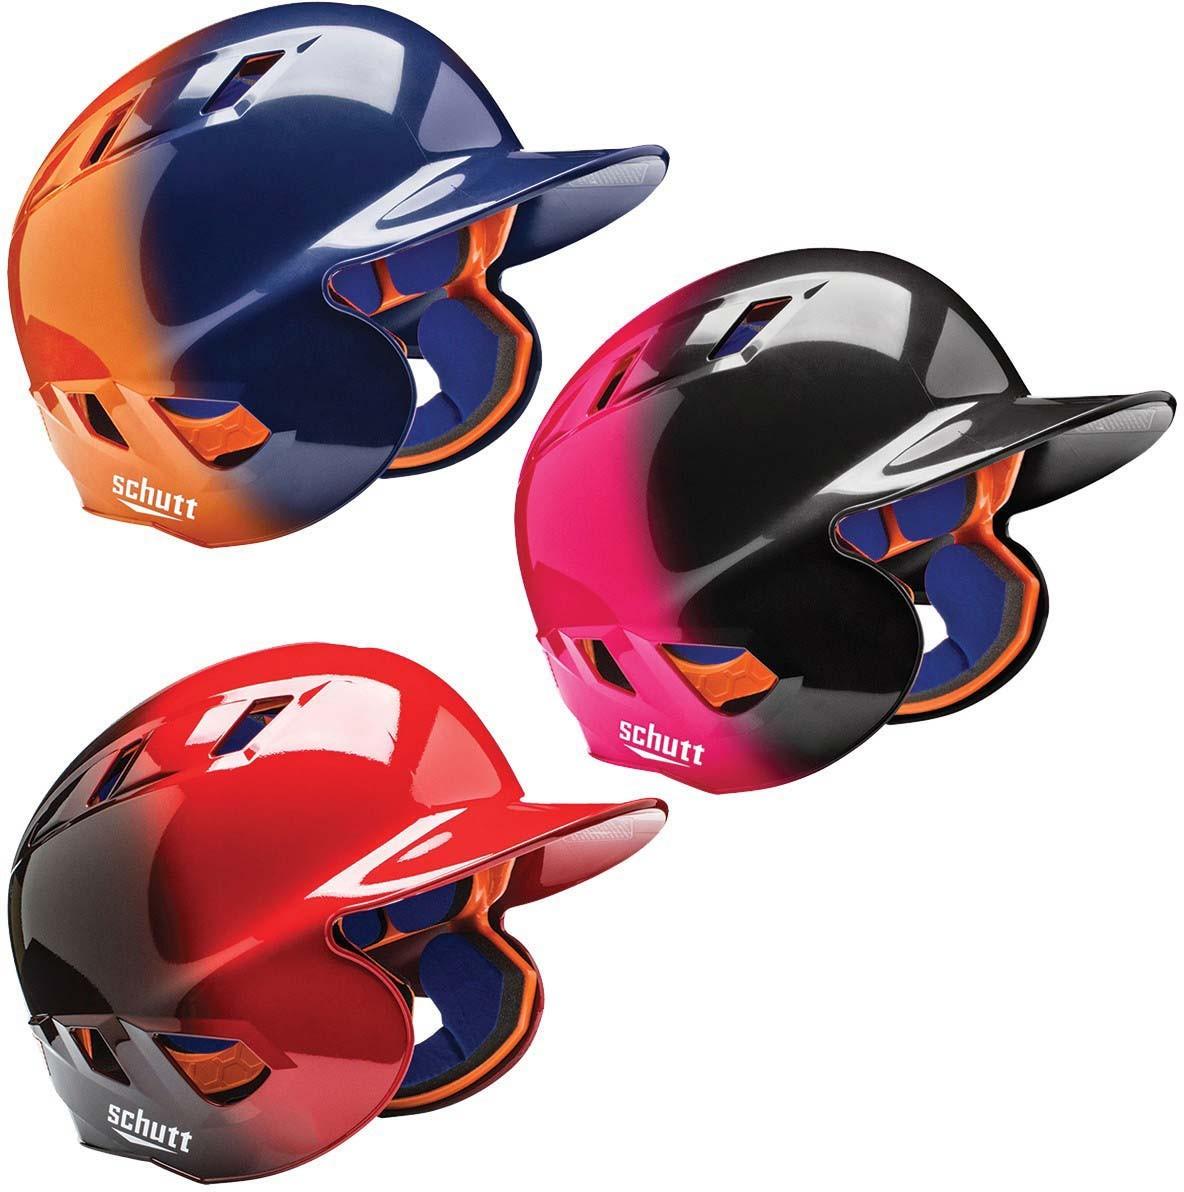 Schutt Air 5 6 Bb Fitted Baseball Batting Helmet 2 Color